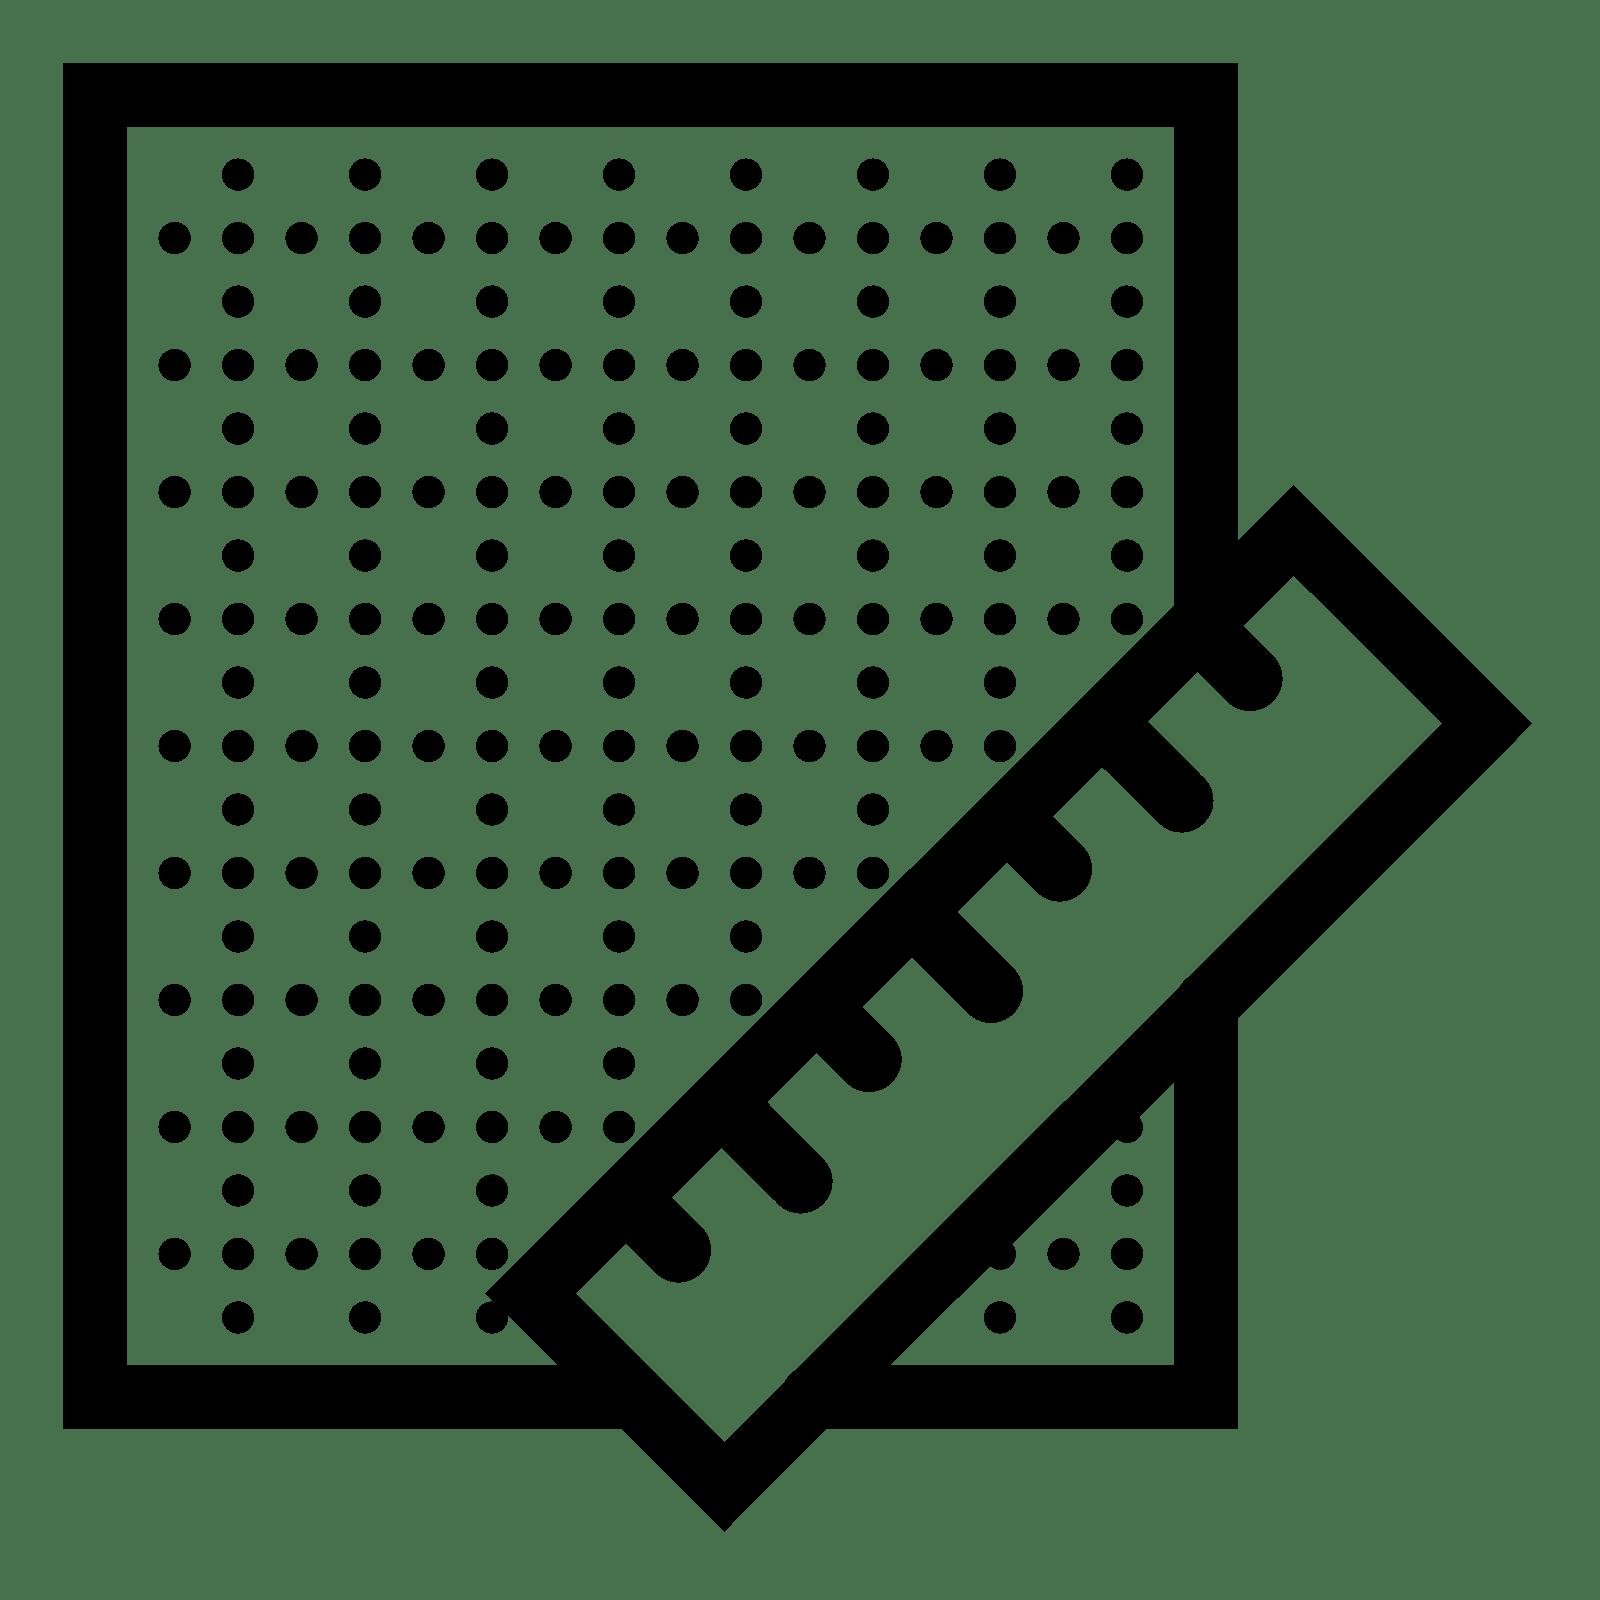 Clipart Ruler Horizontal Clipart Ruler Horizontal